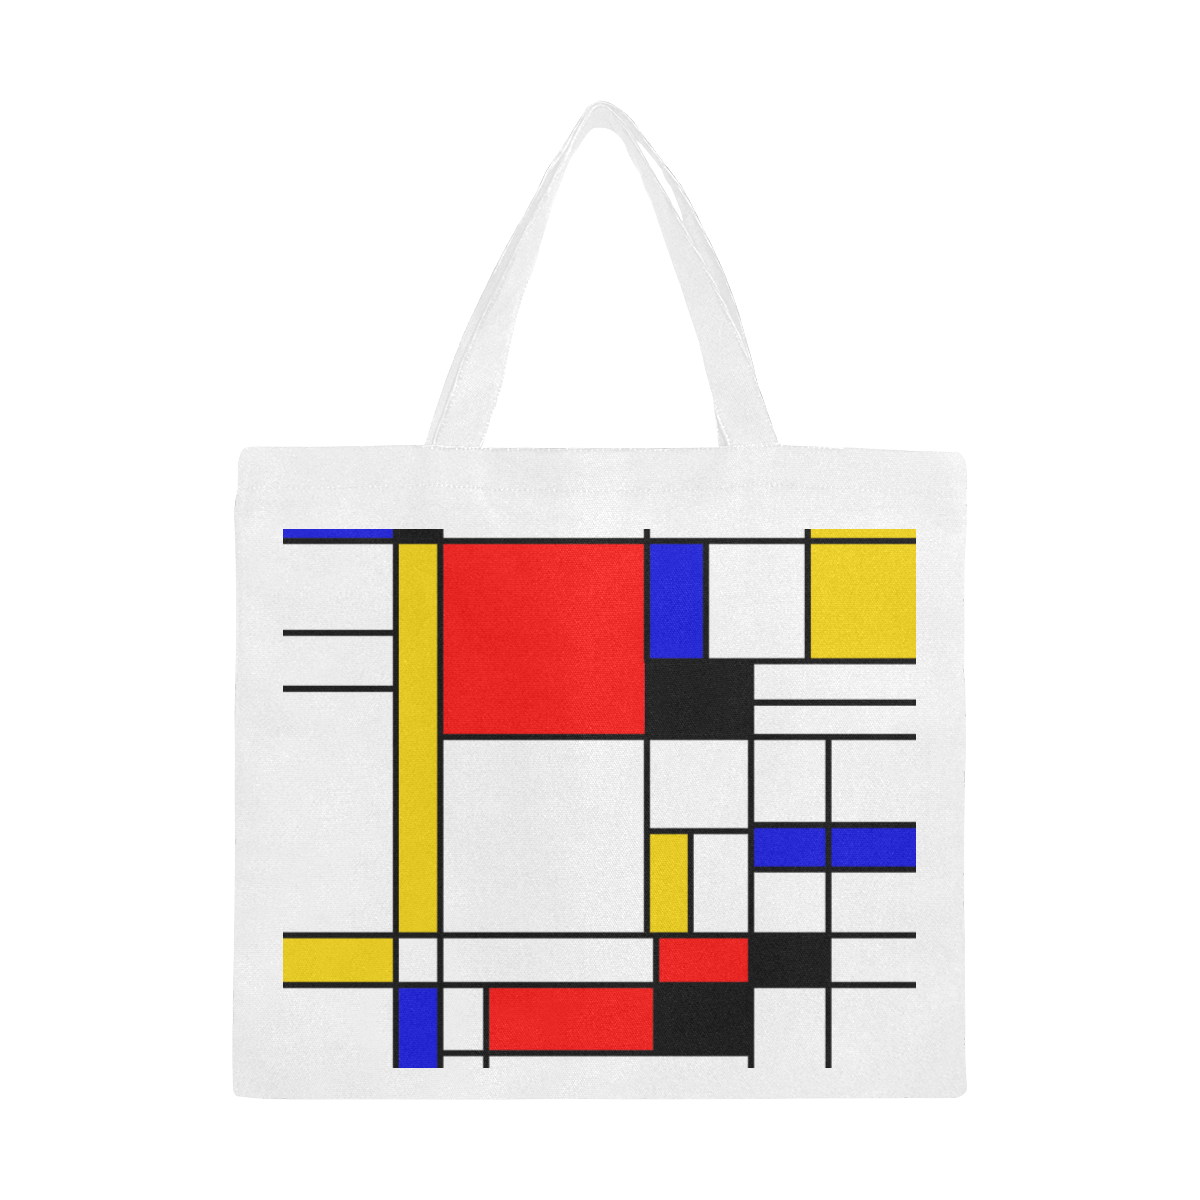 Bauhouse Composition Mondrian Style Canvas Tote Bag/Large (Model 1702)